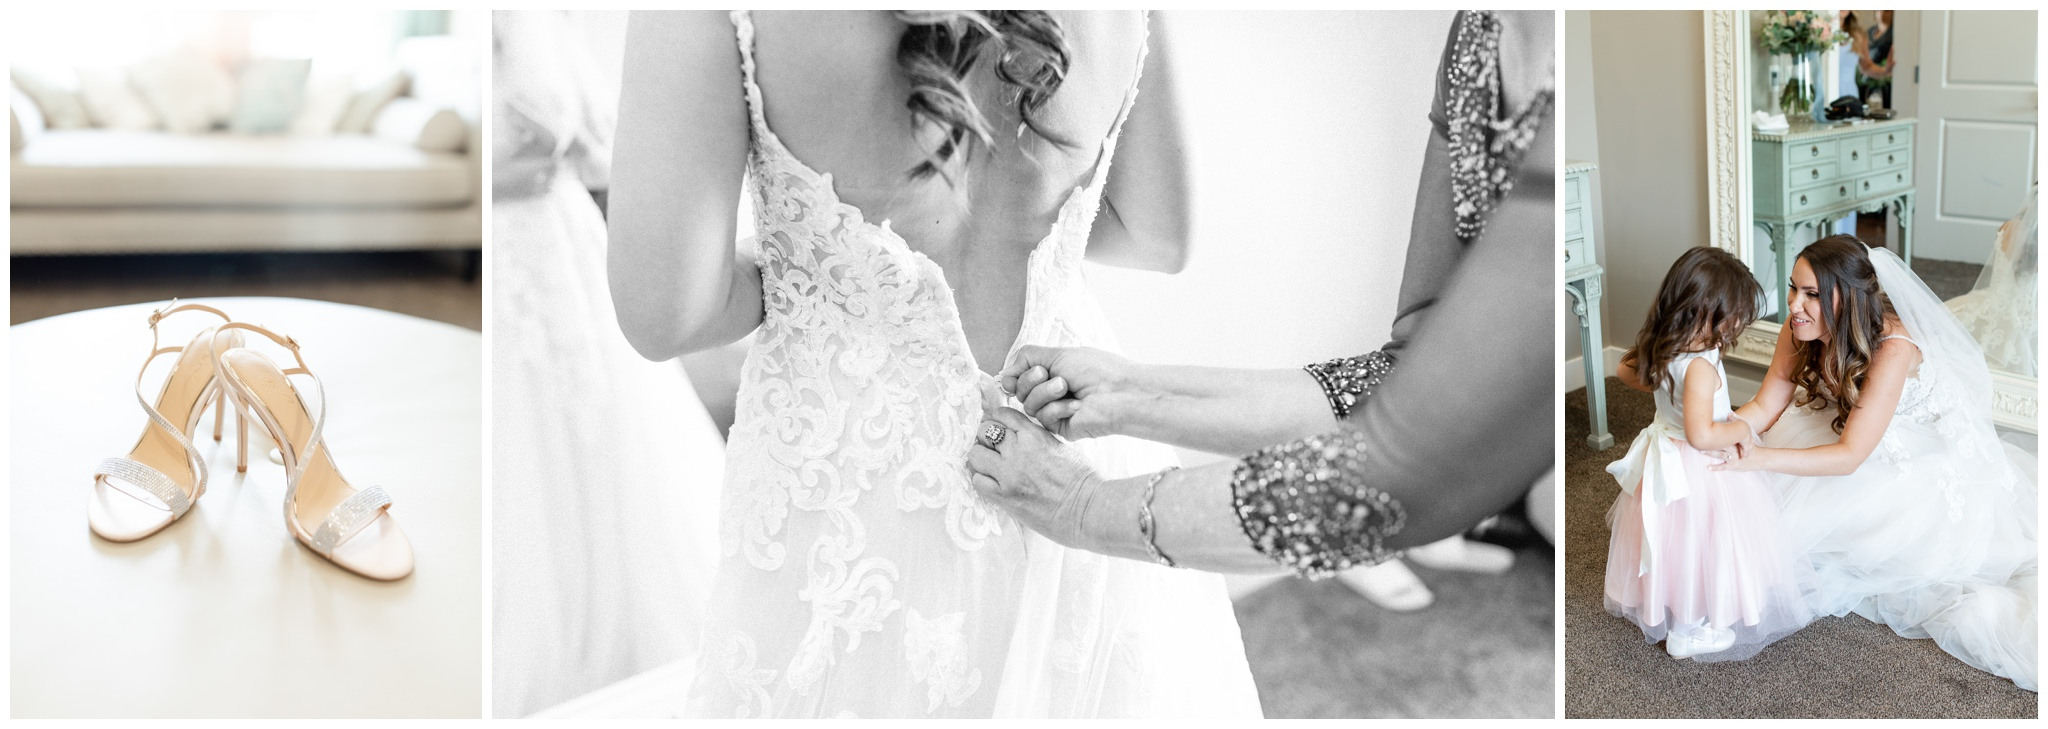 Getting ready images in the Sunset Bridal Room at Sleepy Ridge wedding Venue in Orem, Utah